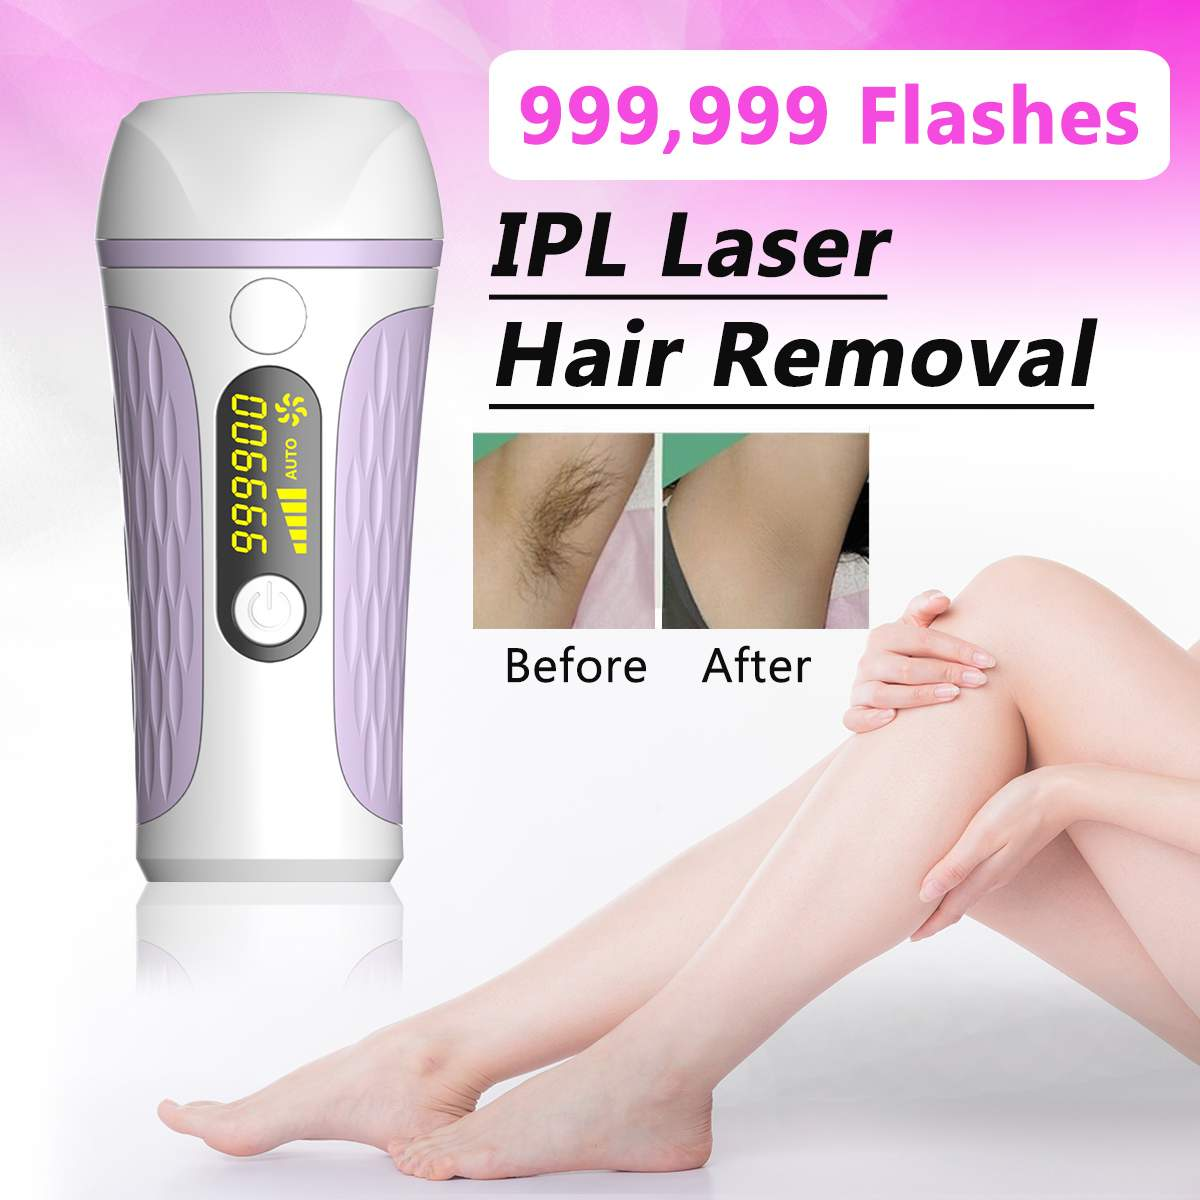 999999 Flash 36W Professional IPL Epilator Laser Hair Removal Photoepilator Machine Depilation 5 Light Energy Levels Device